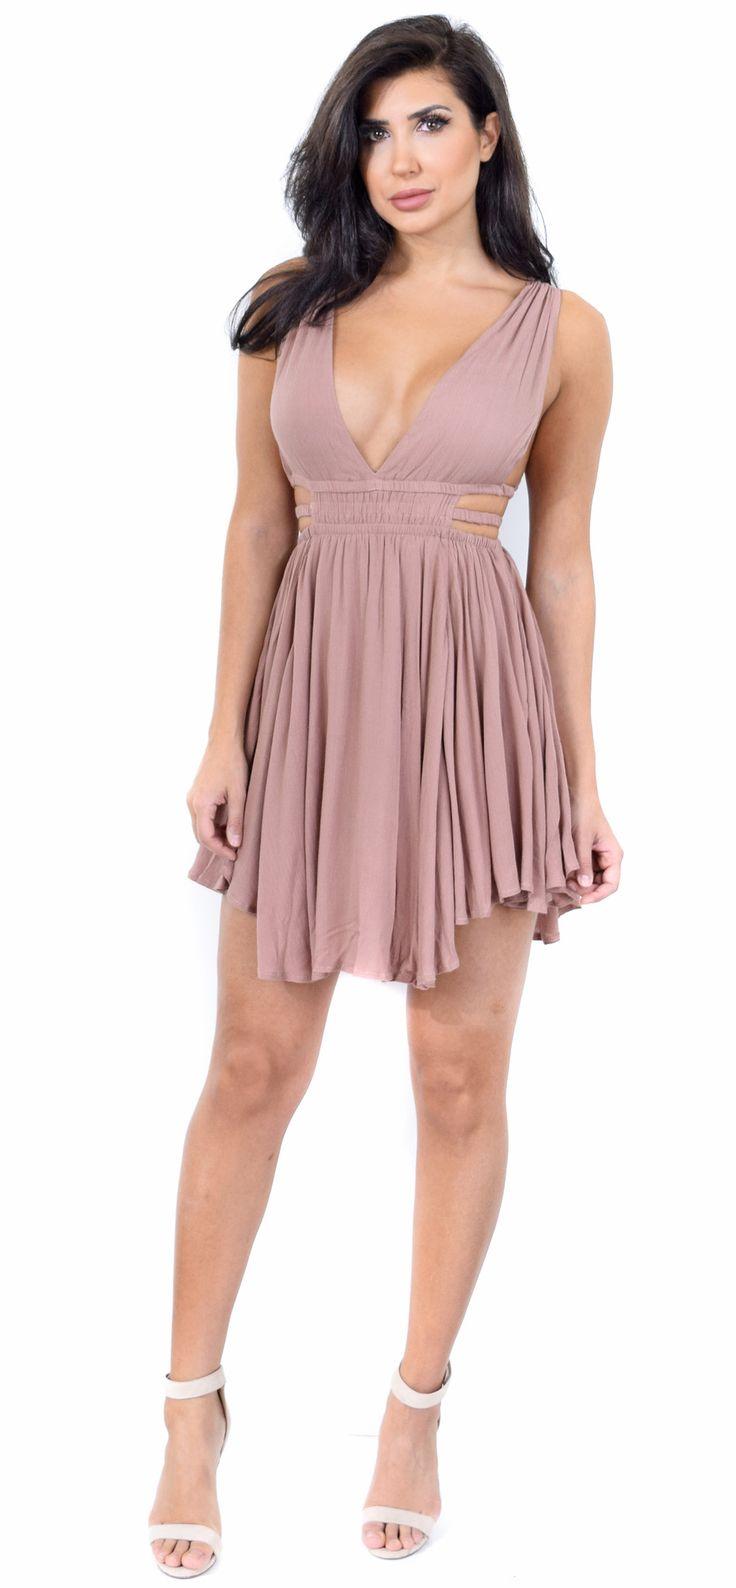 Boutique measurement chart V Neck Half Sleeve Striped Maxi Dress light purple classy small